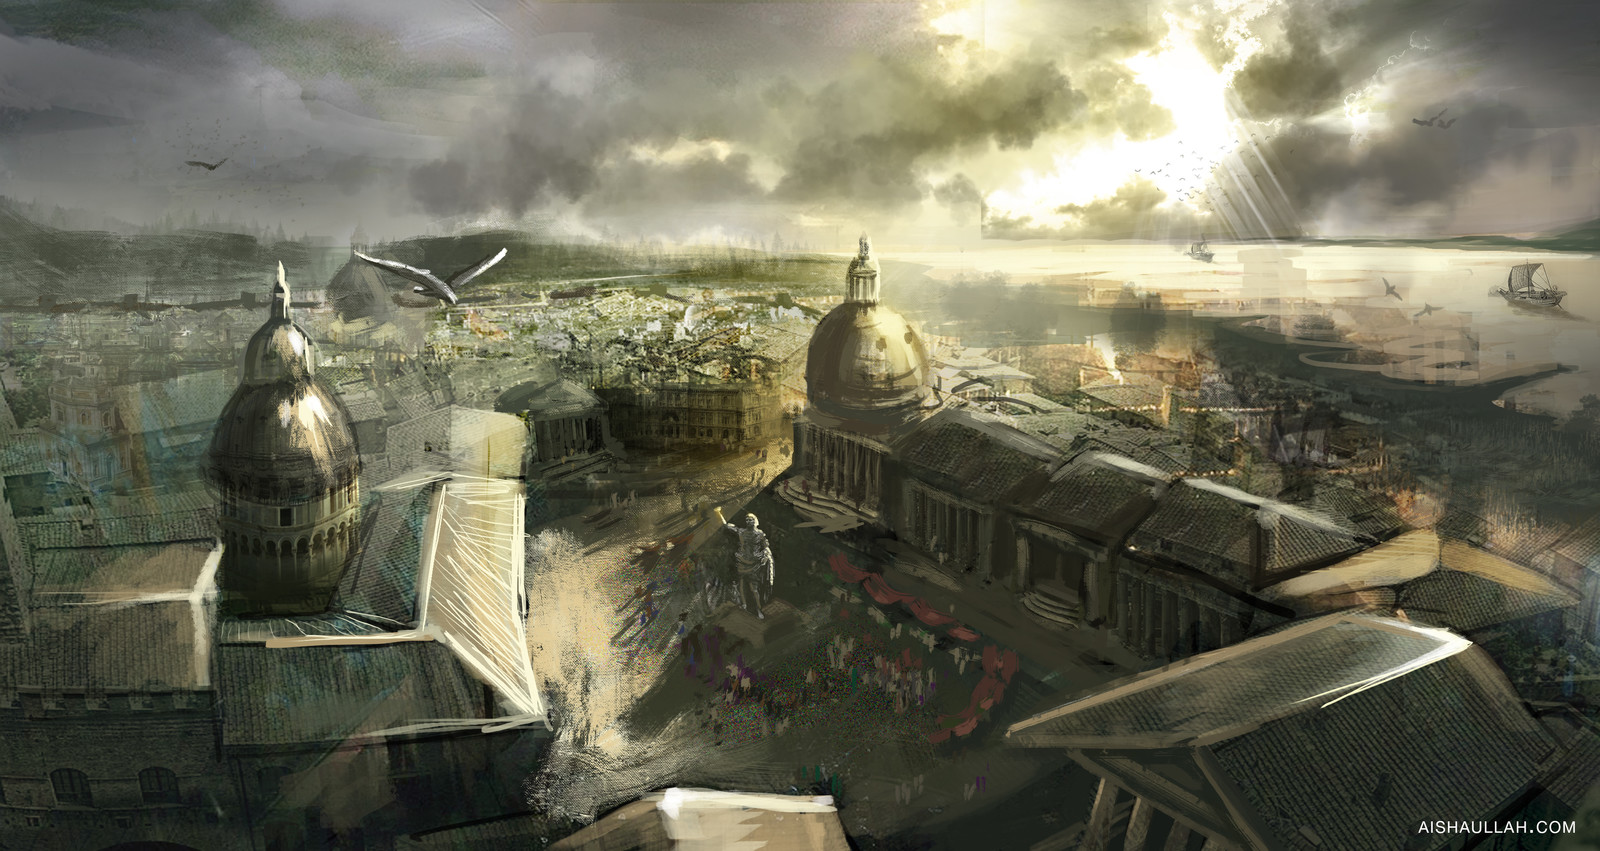 Empire's Colony